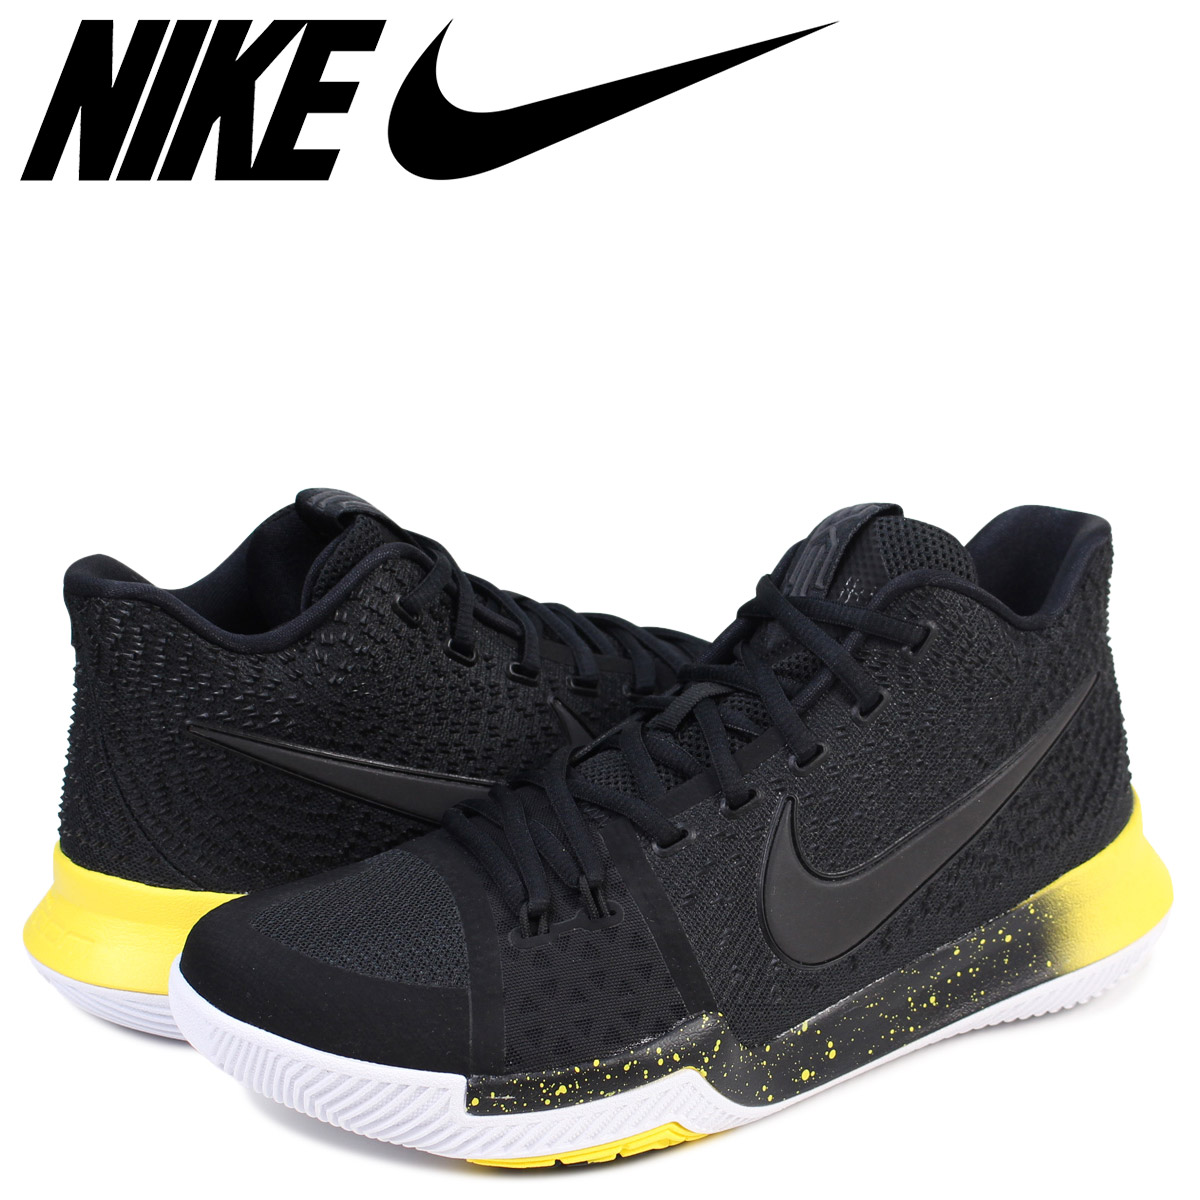 4da539fc2606 ALLSPORTS  NIKE Nike chi Lee 3 sneakers KYRIE 3 EP 852